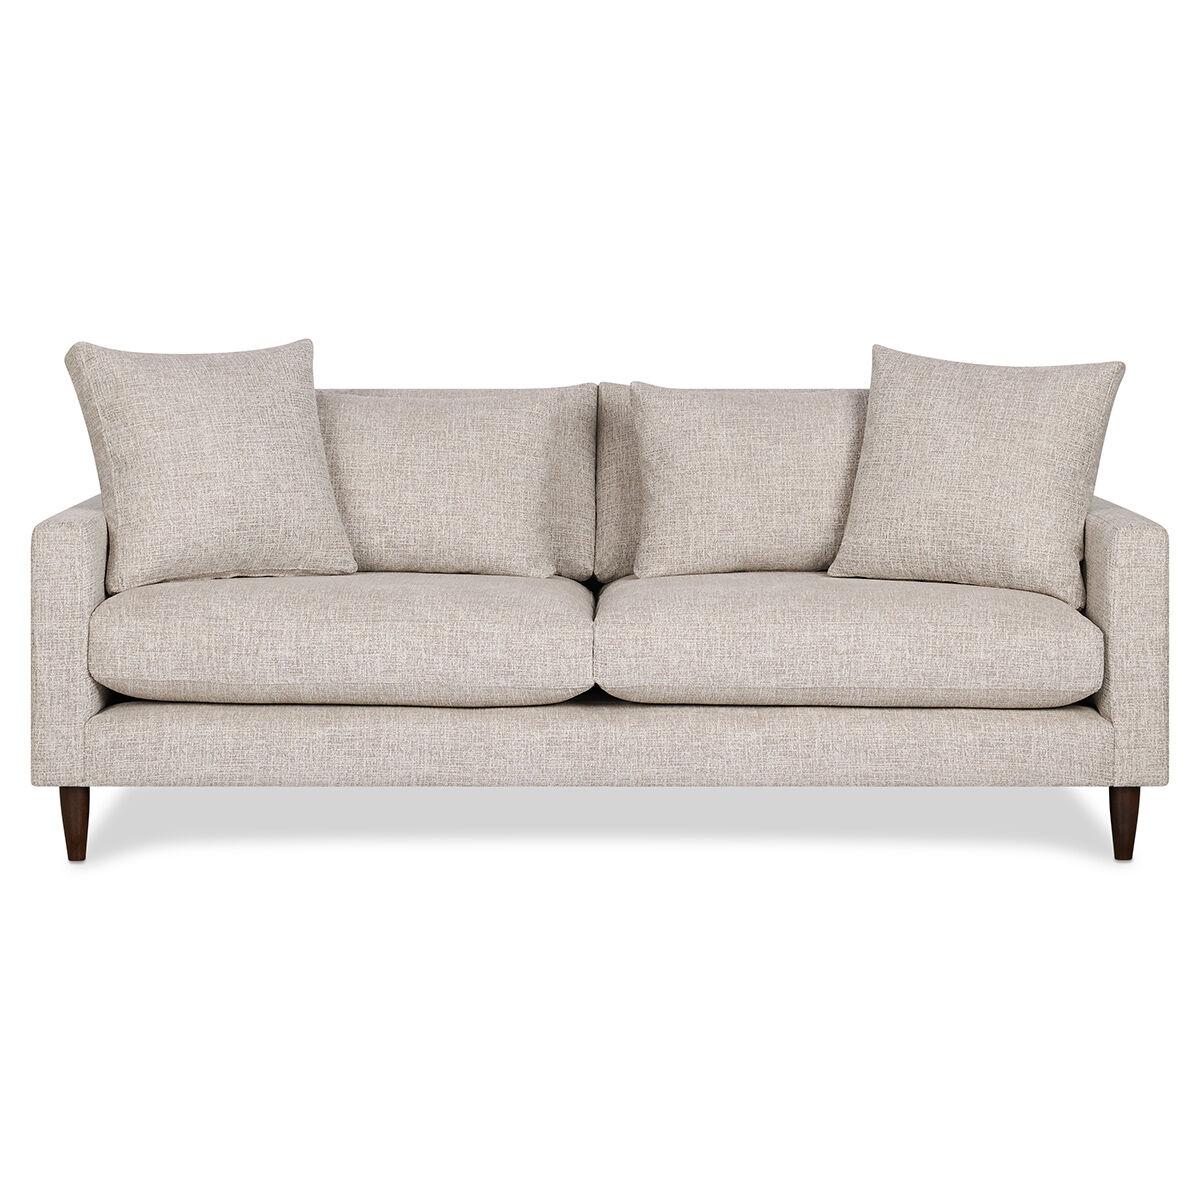 emma tufted sofa deco bed sofas living urban barn nixon giovanna moondust